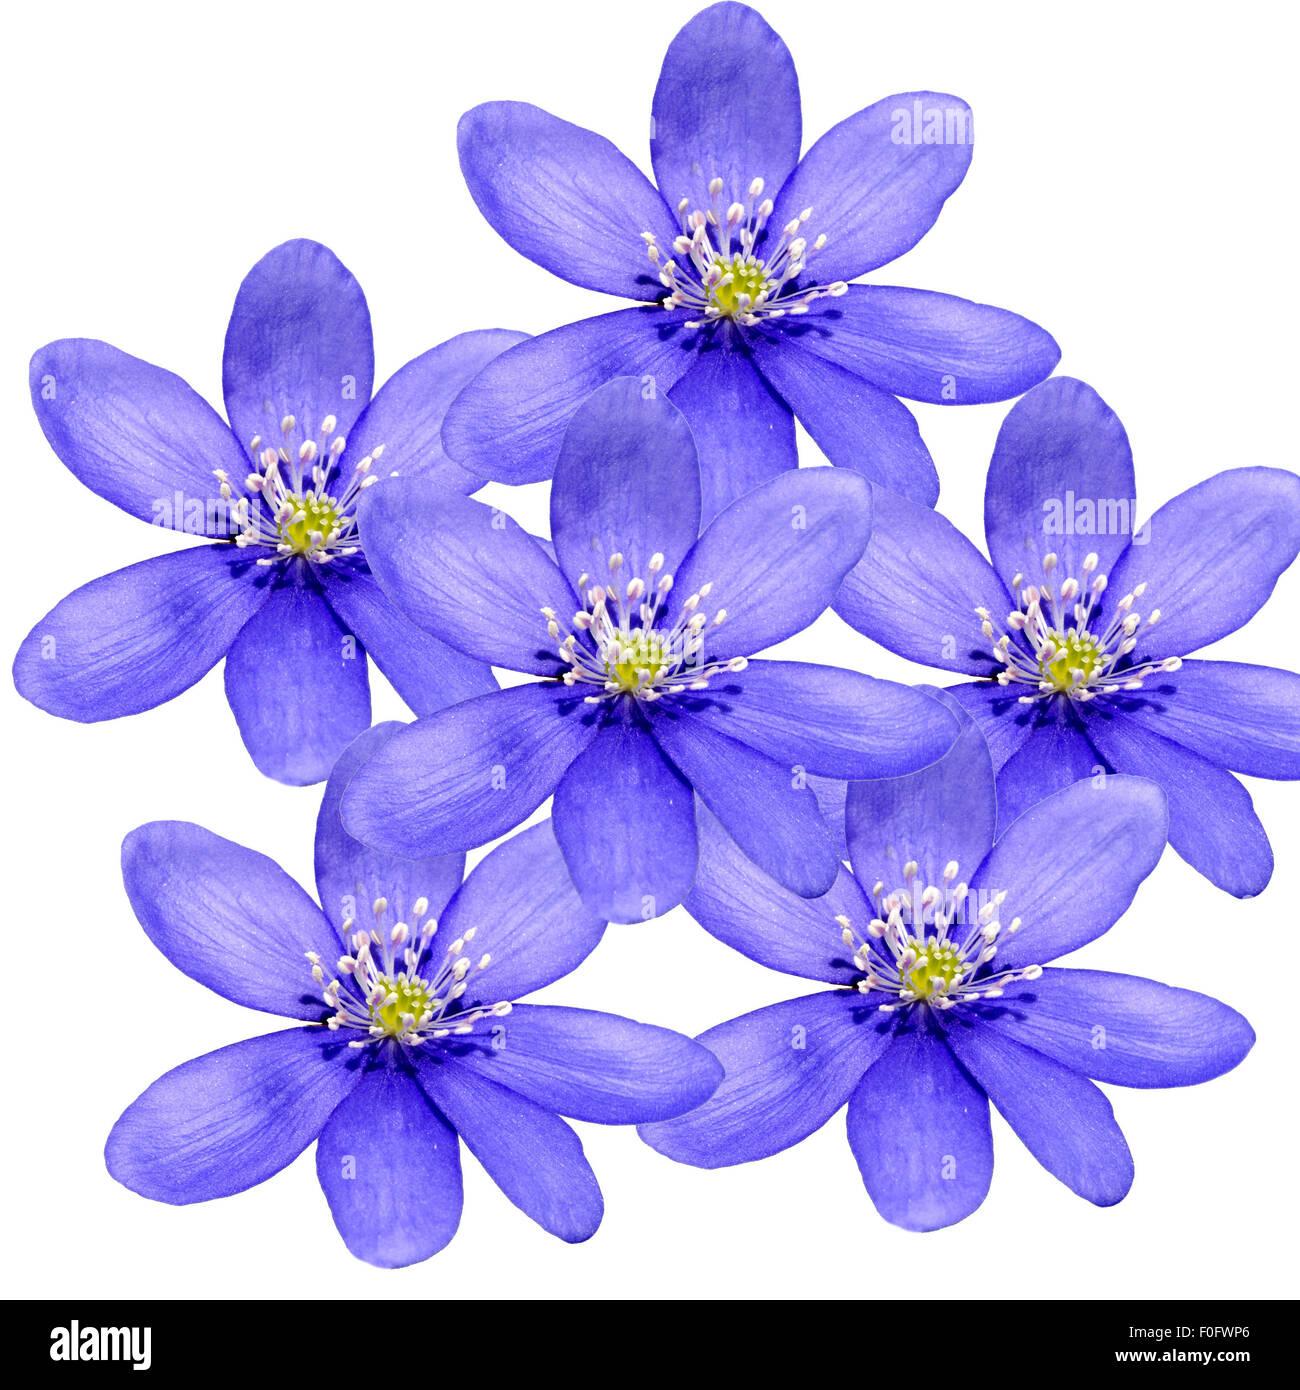 Leberbluemchen, Hepatica nobilis, Winterblueher, anémone, hepatica, blaue blueten, Blau, Blume des Jahres 2013, - Banque D'Images